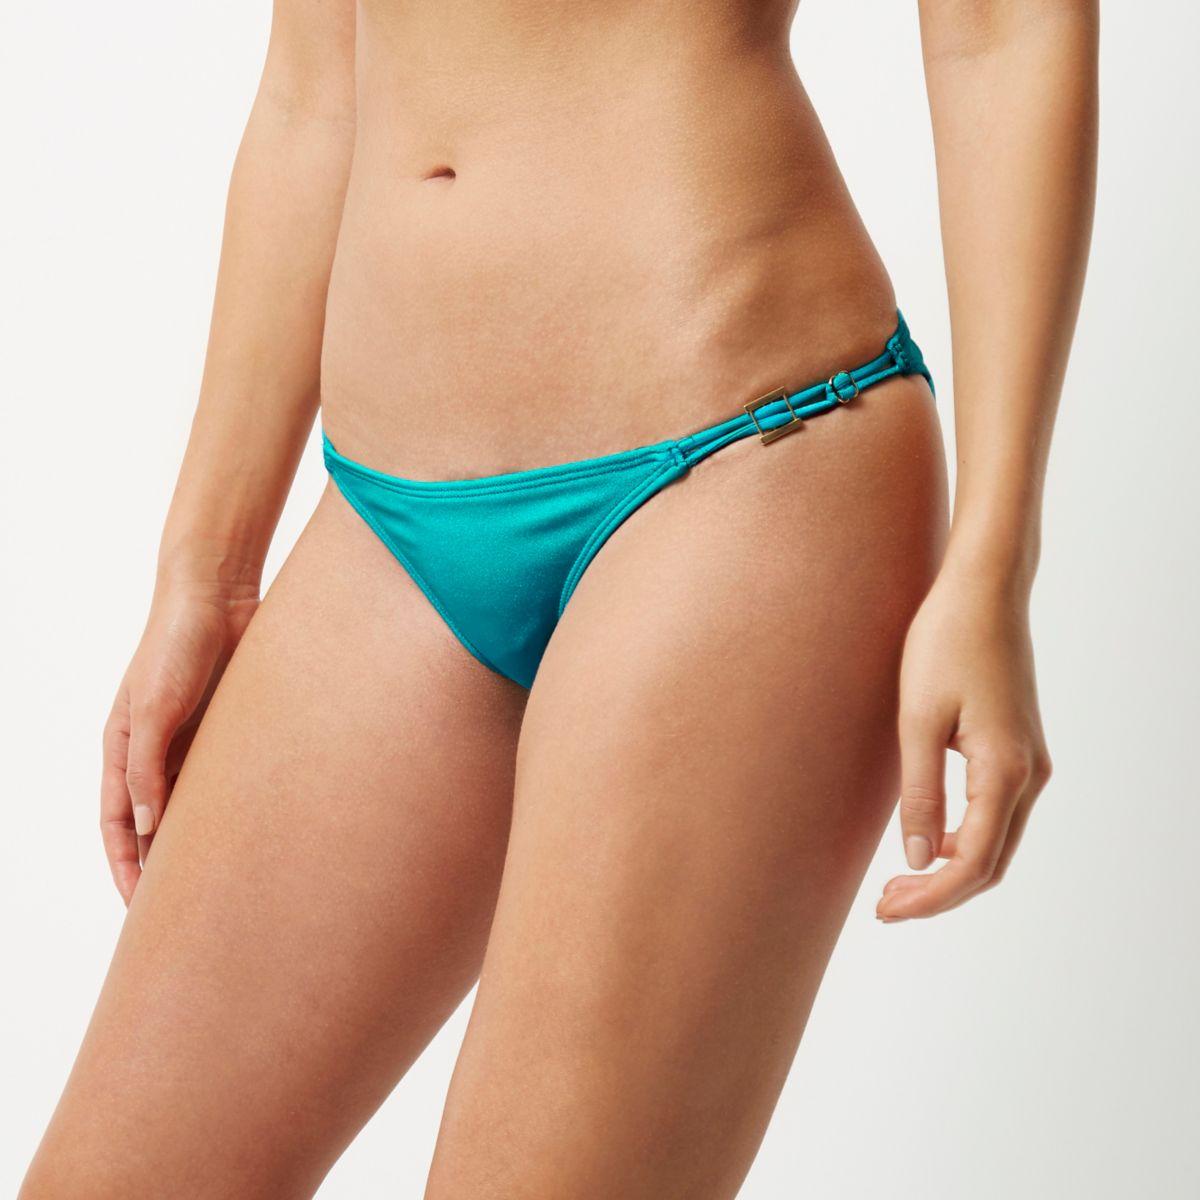 These alluring bikini bottoms sale